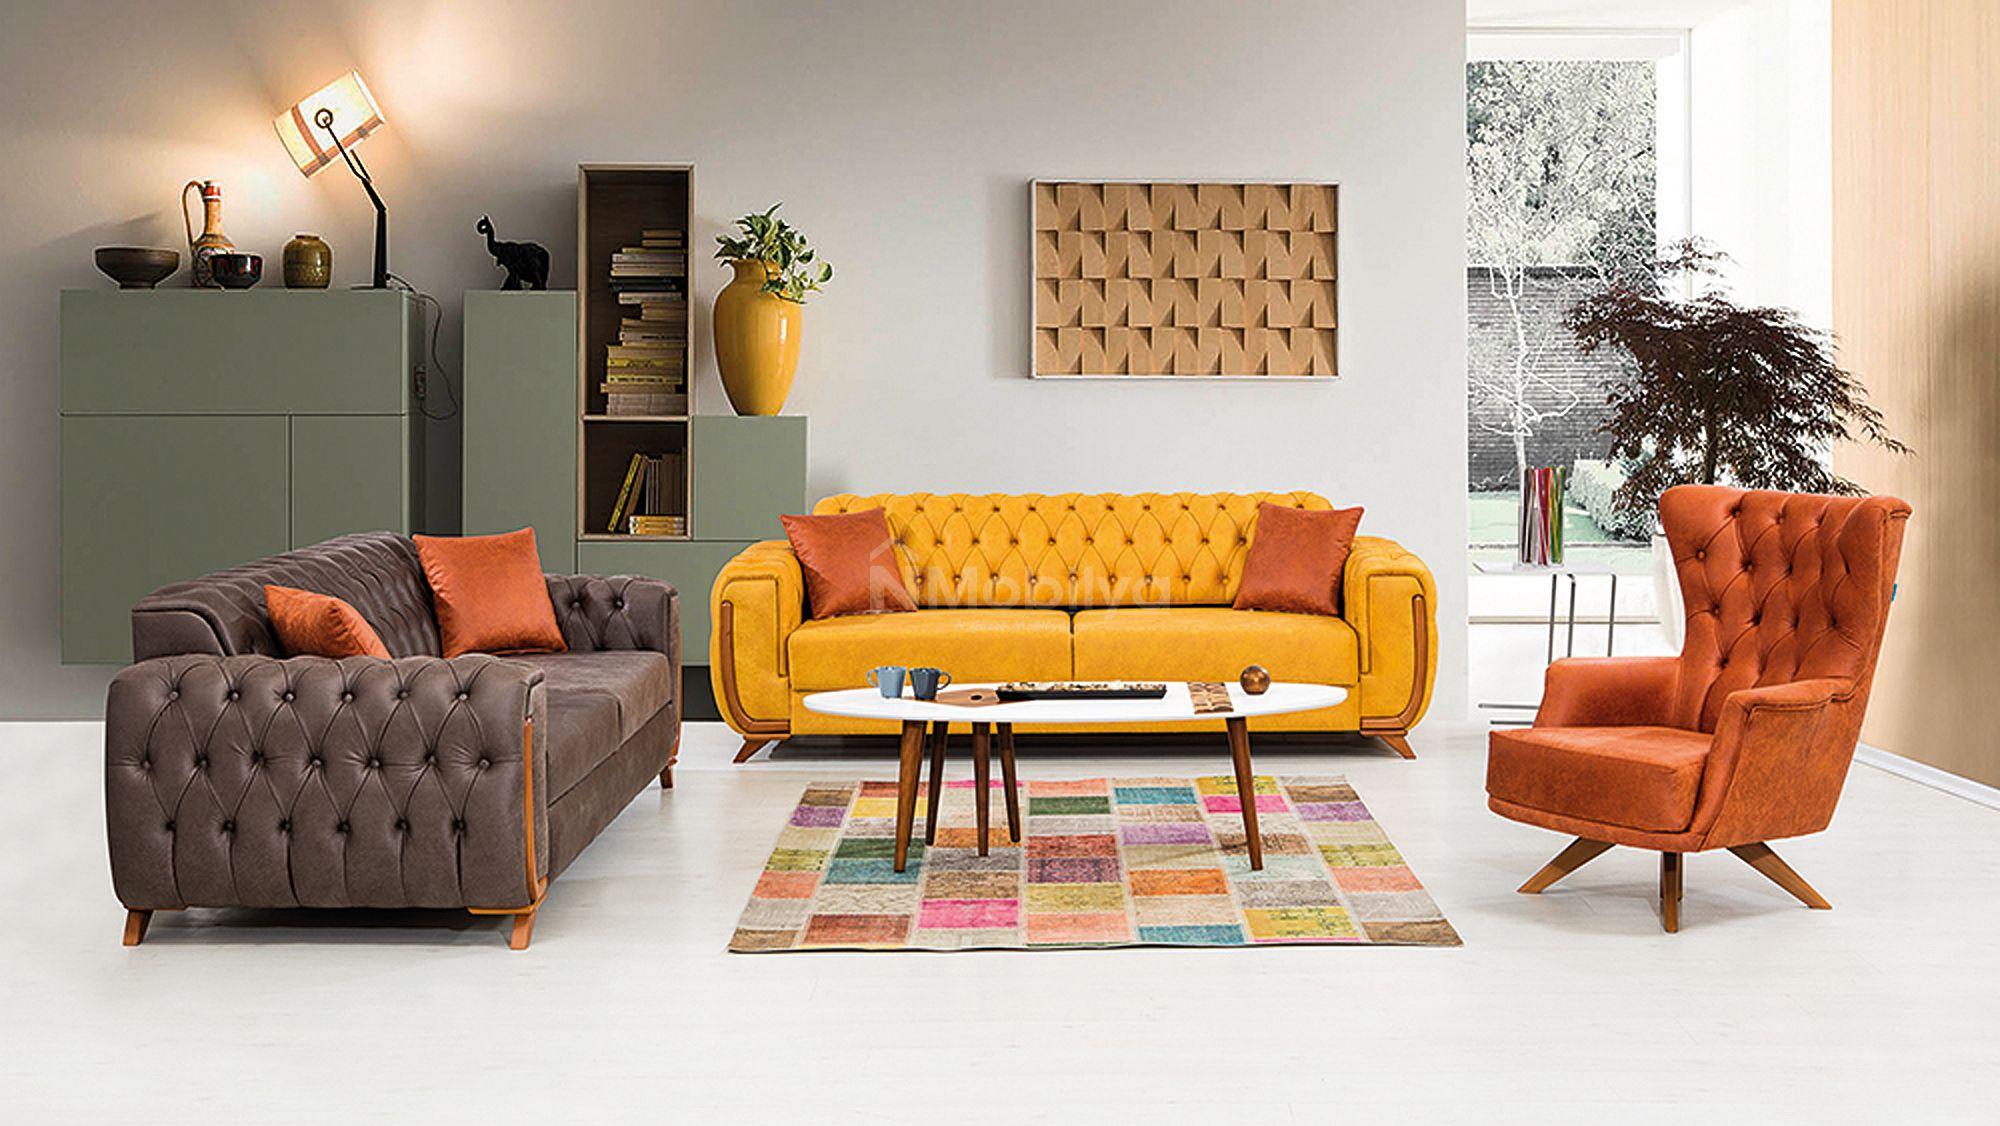 Koltuk Takimlari Home Decor Modern Cozy Living Room Bohemian Style Bedrooms